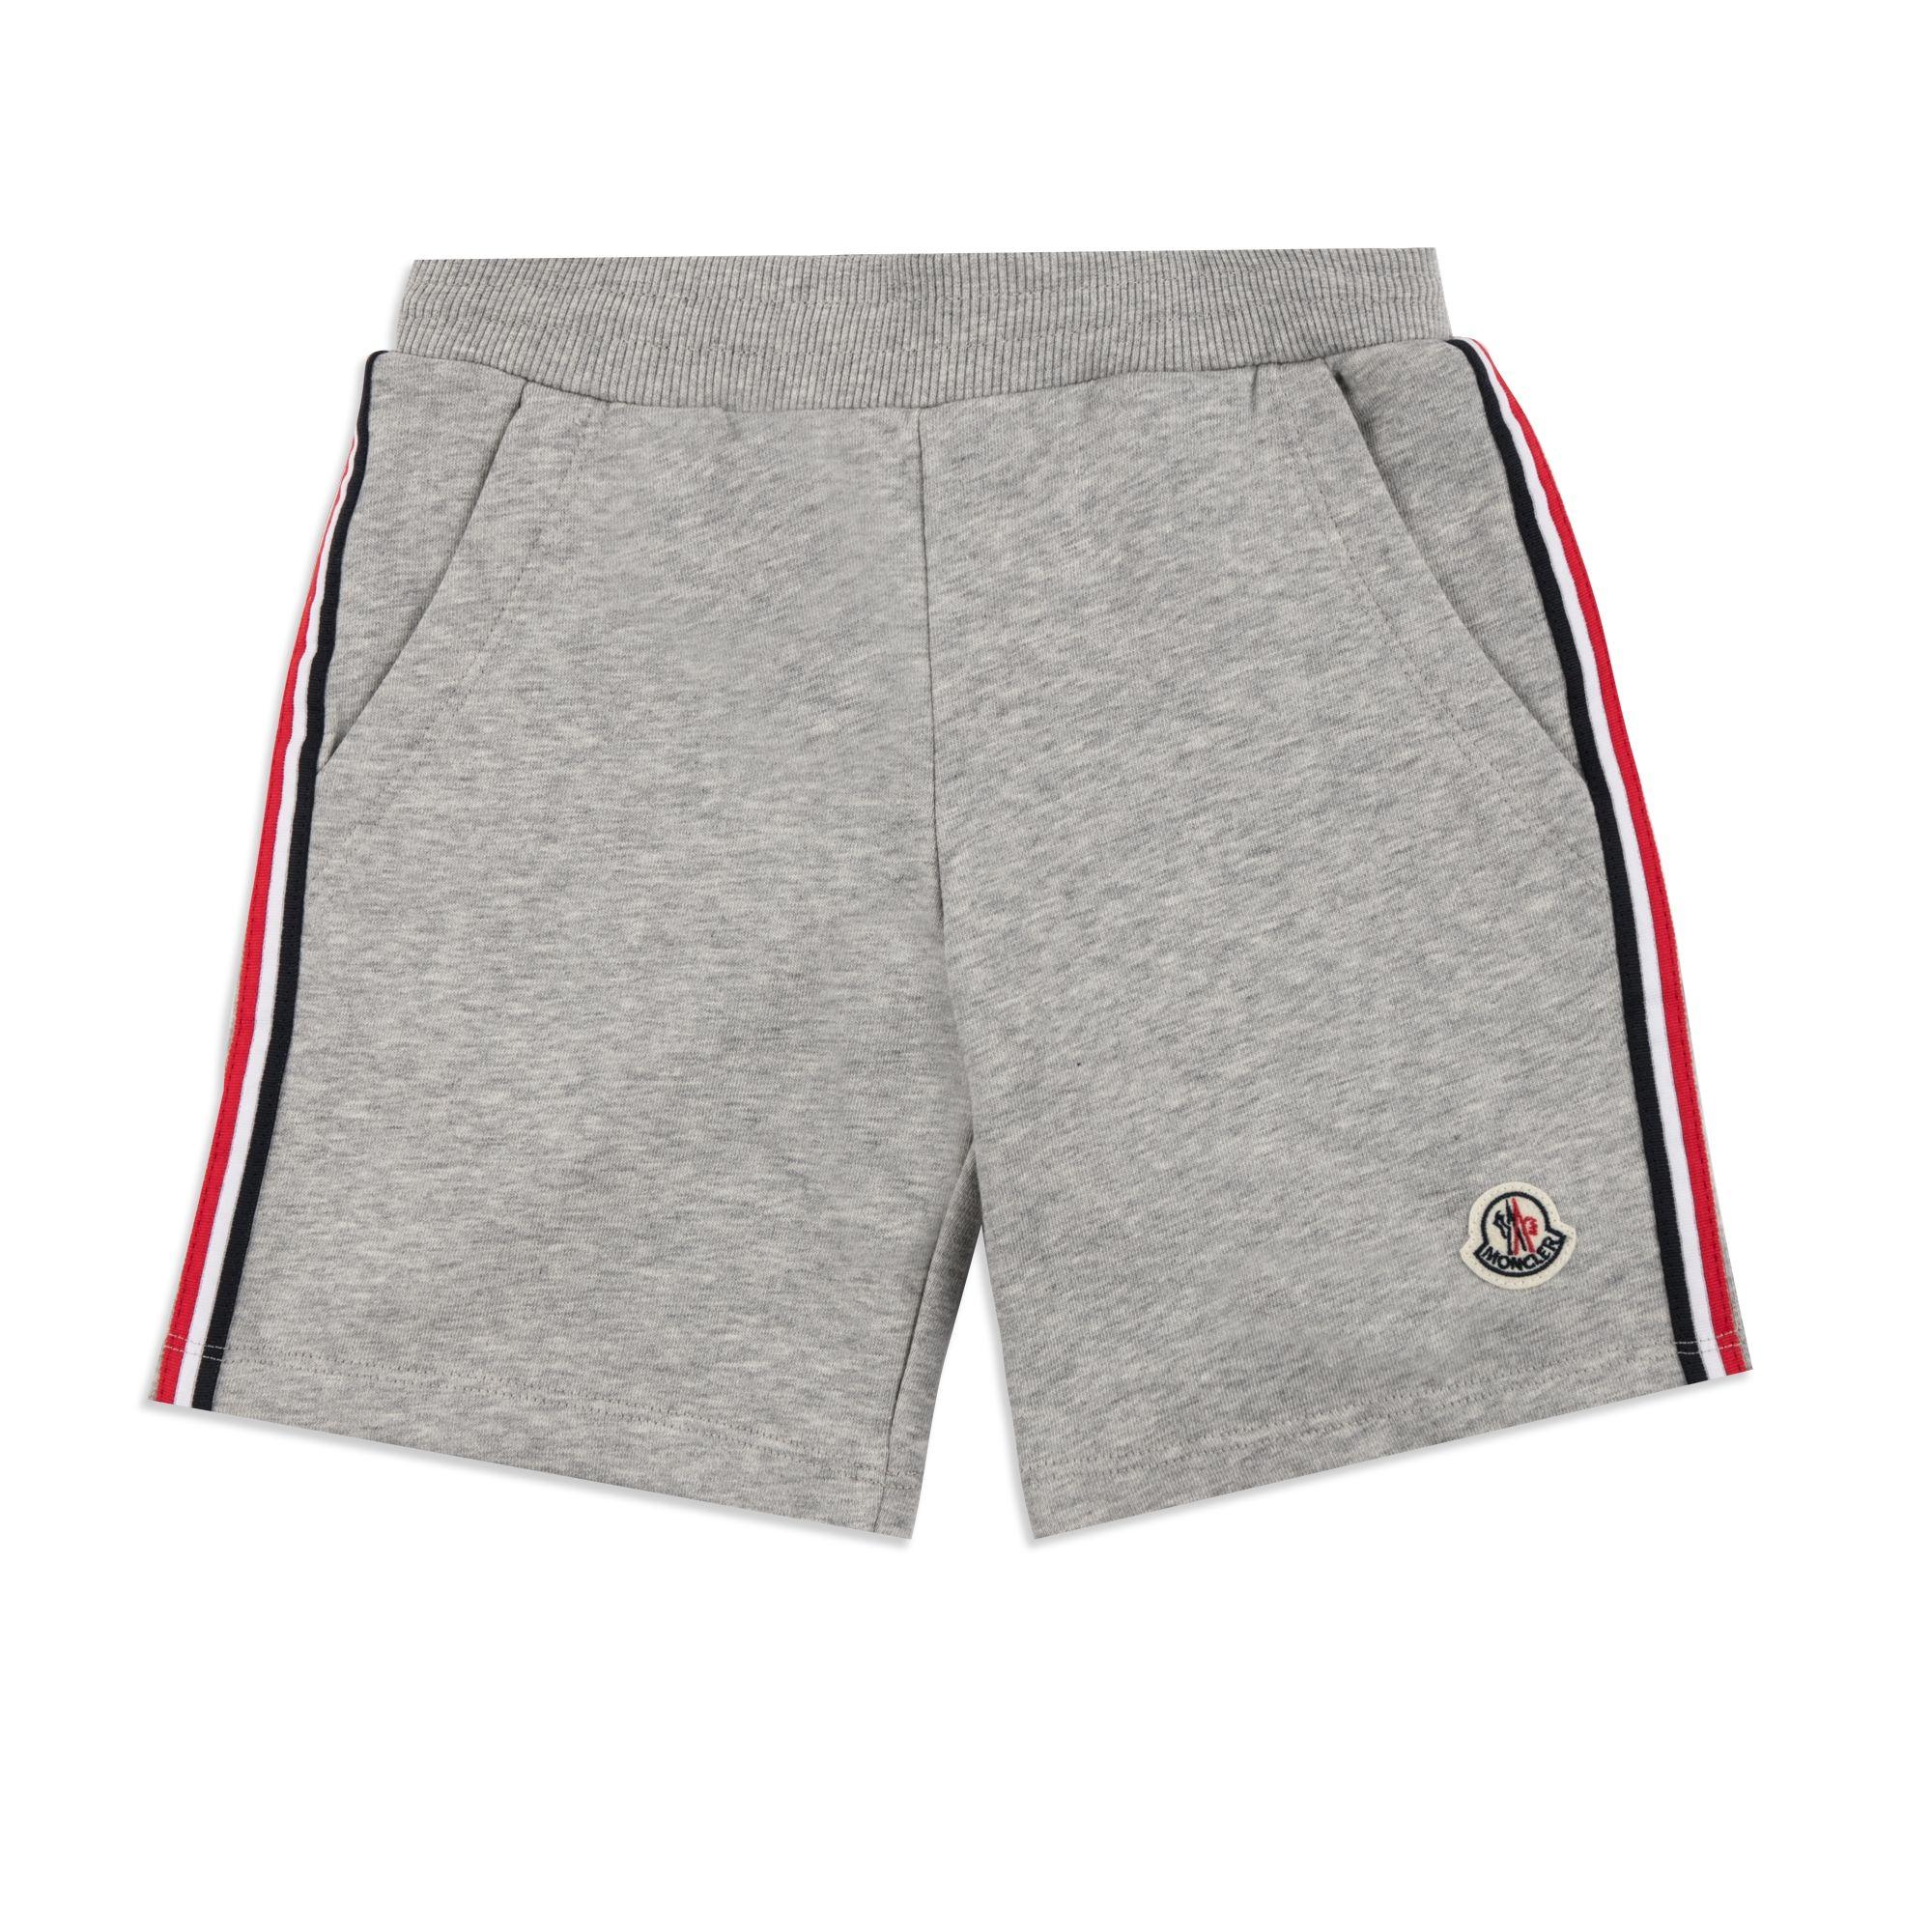 e66c36b89e5b1 MONCLER Boys Striped Trim Sweat Shorts - Grey Boys sweat shorts • Soft  cotton jersey • Elasticated waist • Drawstring ties • Three pocket design •  Signature ...